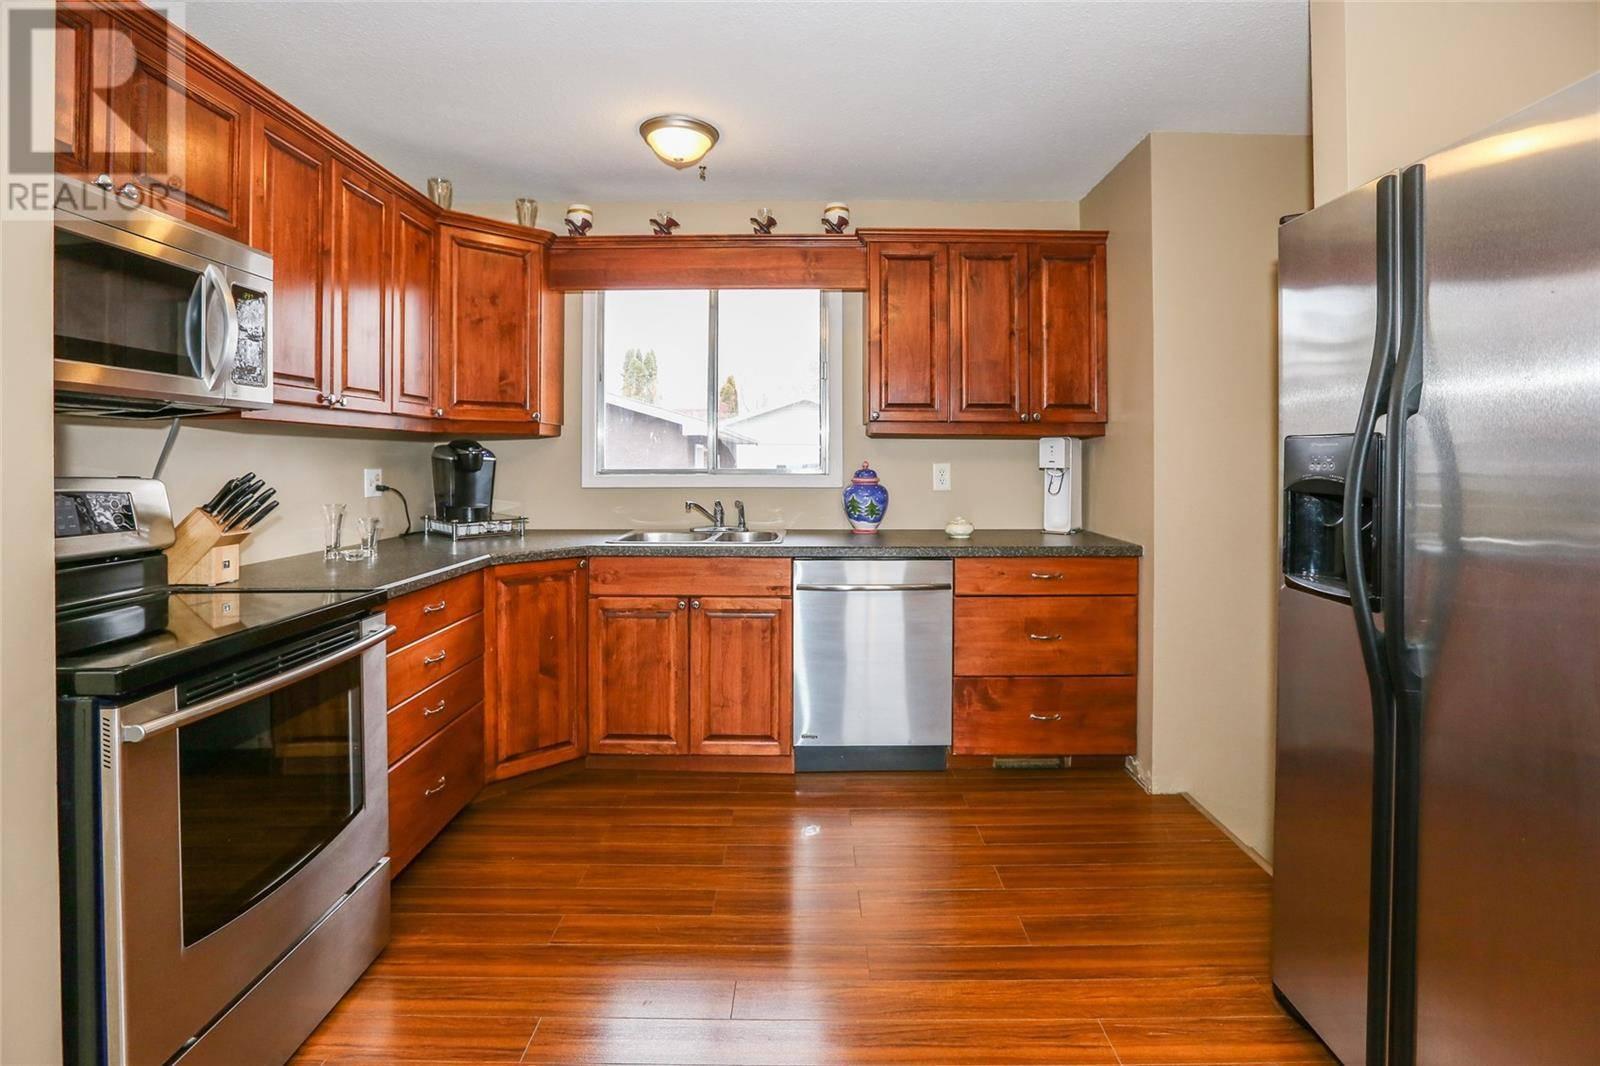 House for sale at 3429 33rd St W Saskatoon Saskatchewan - MLS: SK790313